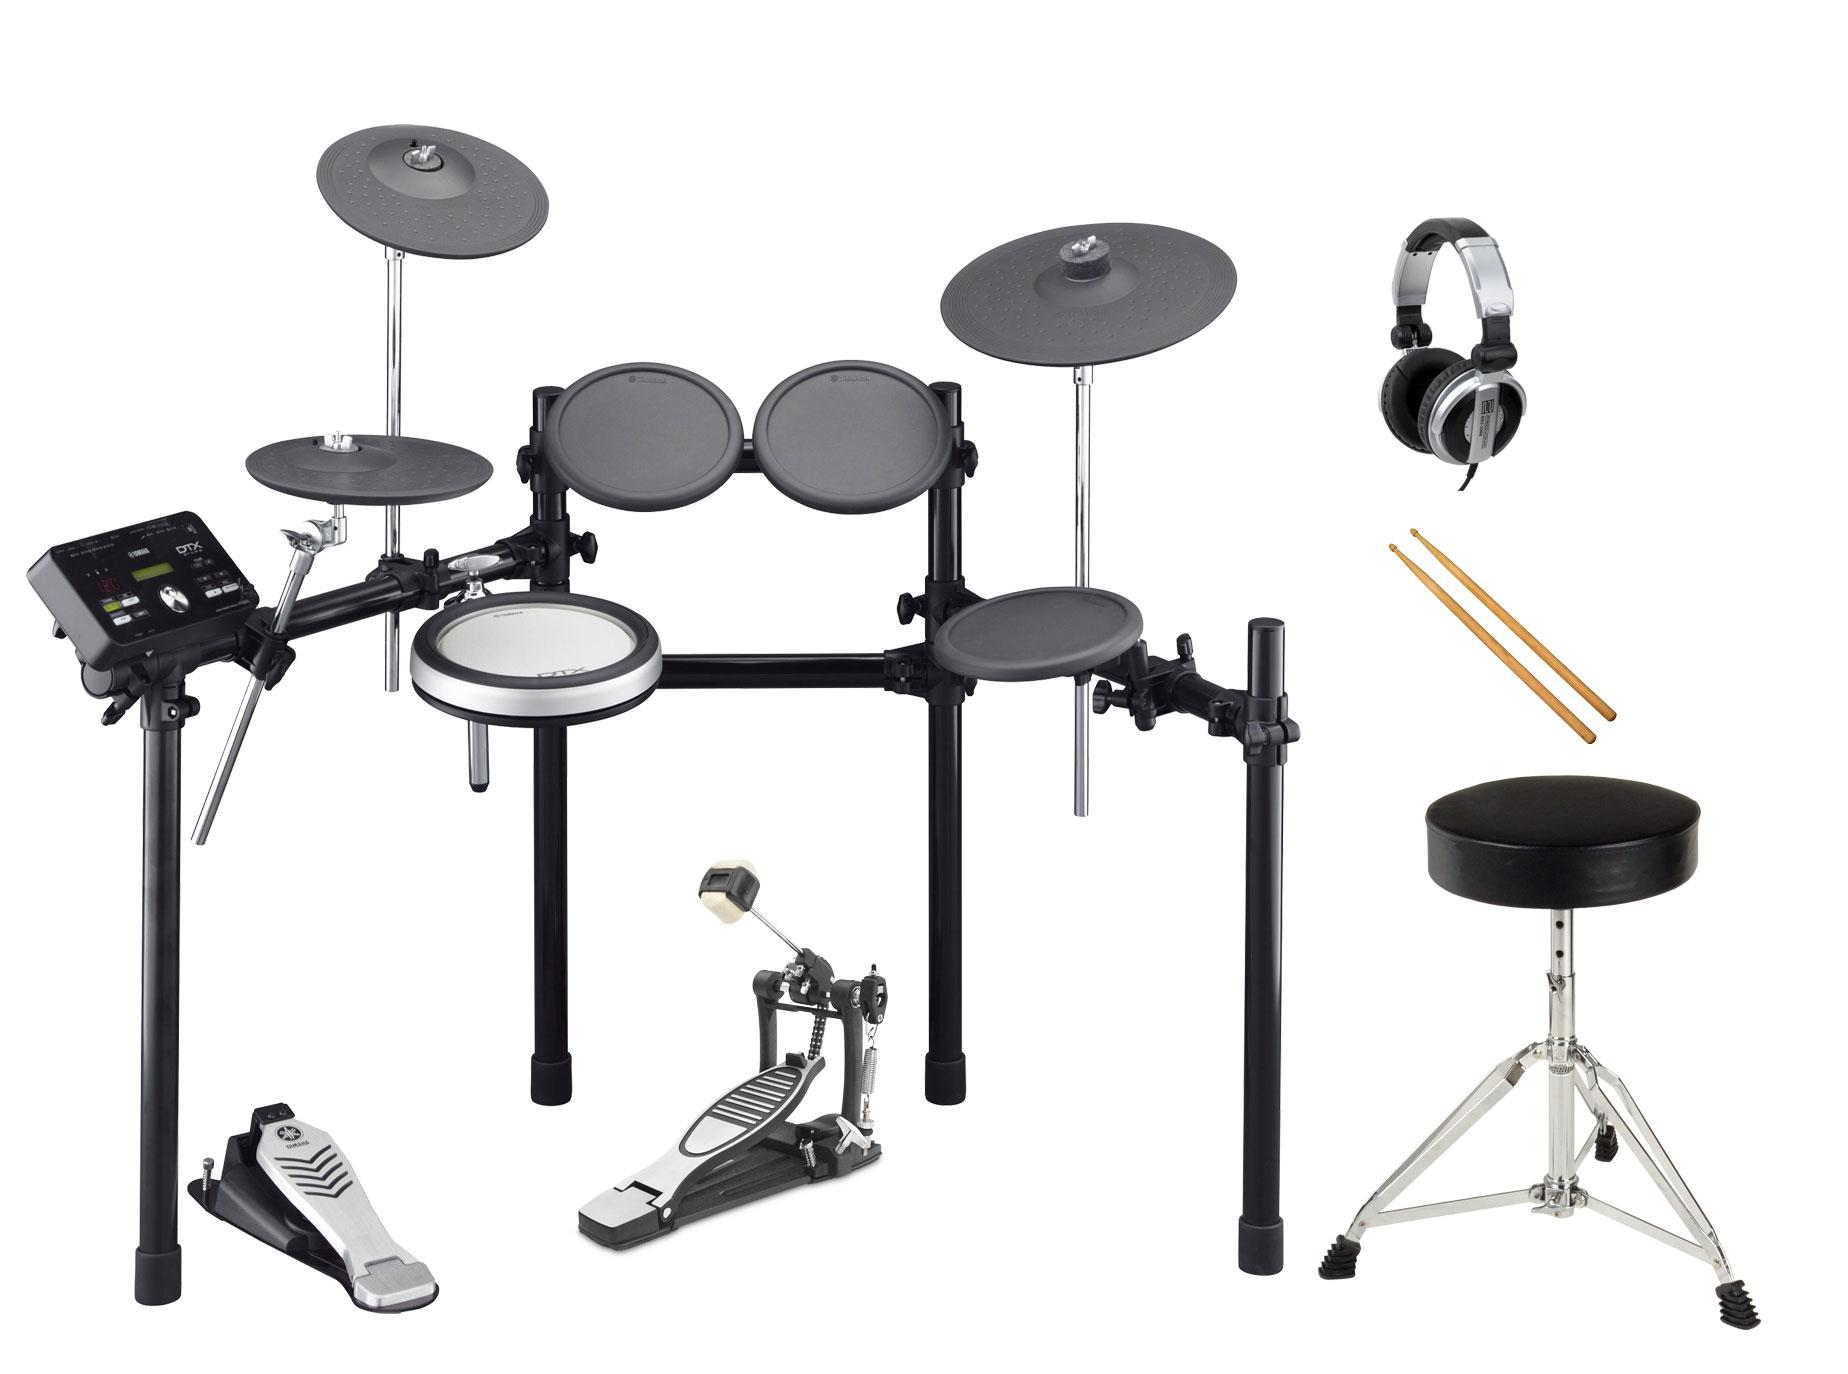 Yamaha DTX522K Compact E Drum SET inkl. Fußmaschine, Hocker, Sticks und Kopfhörer